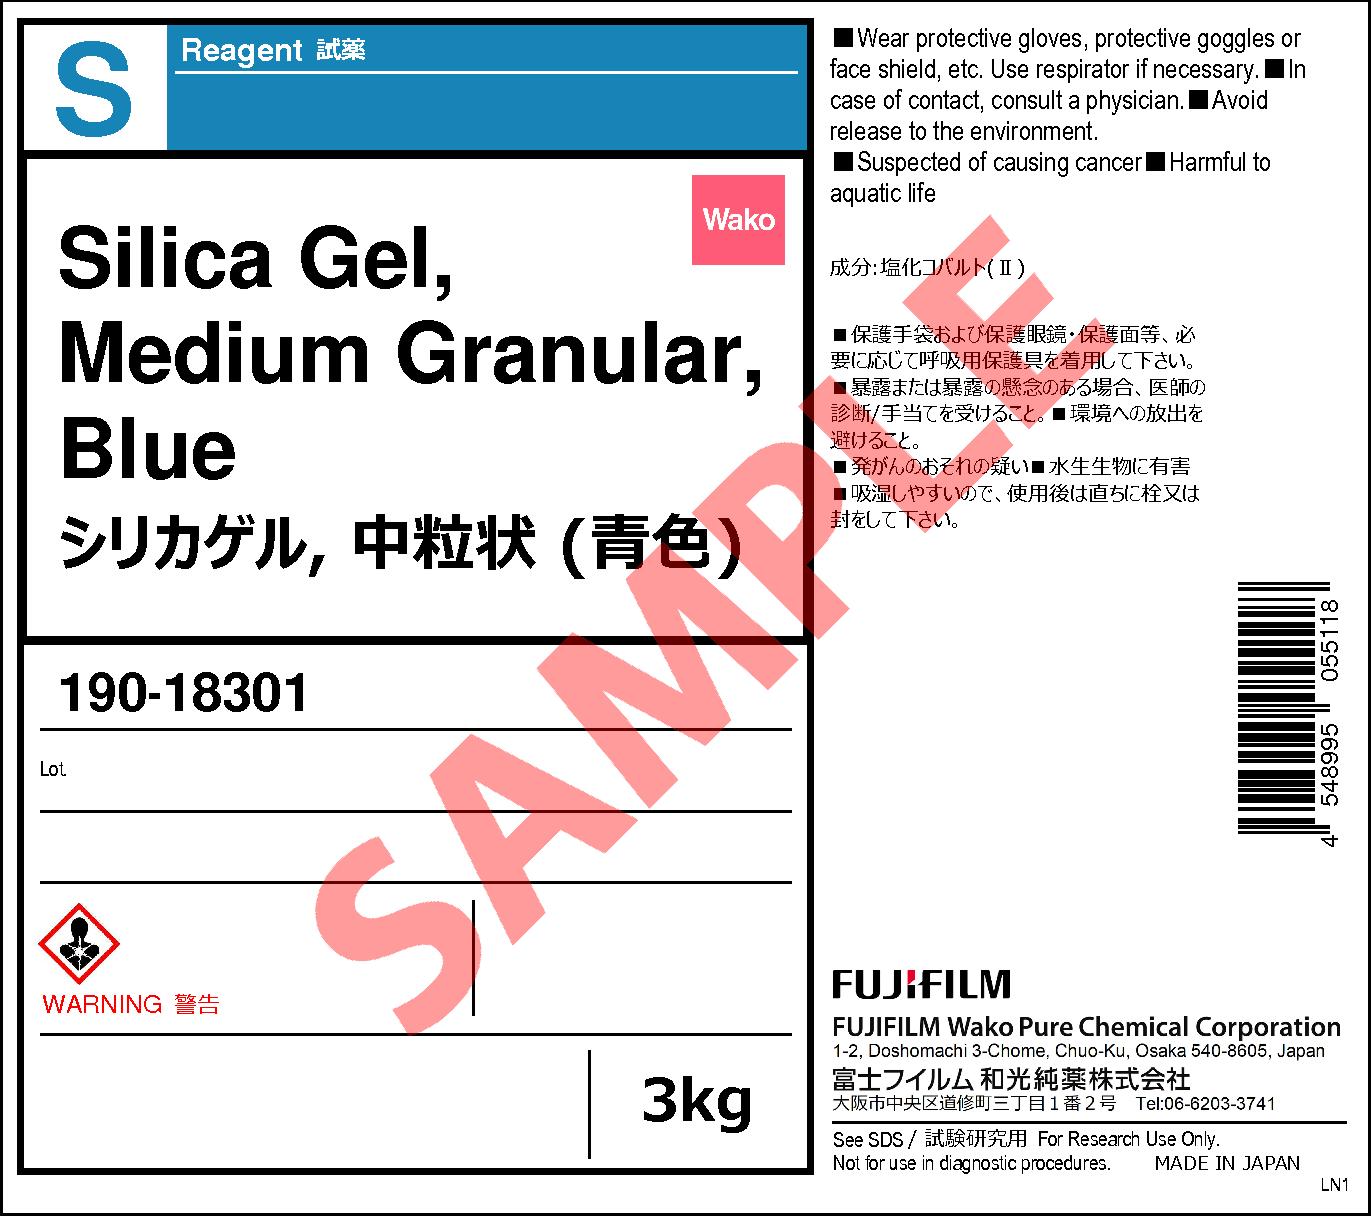 7631-86-9・Silica Gel, Medium Granular, Blue・190-18301・198